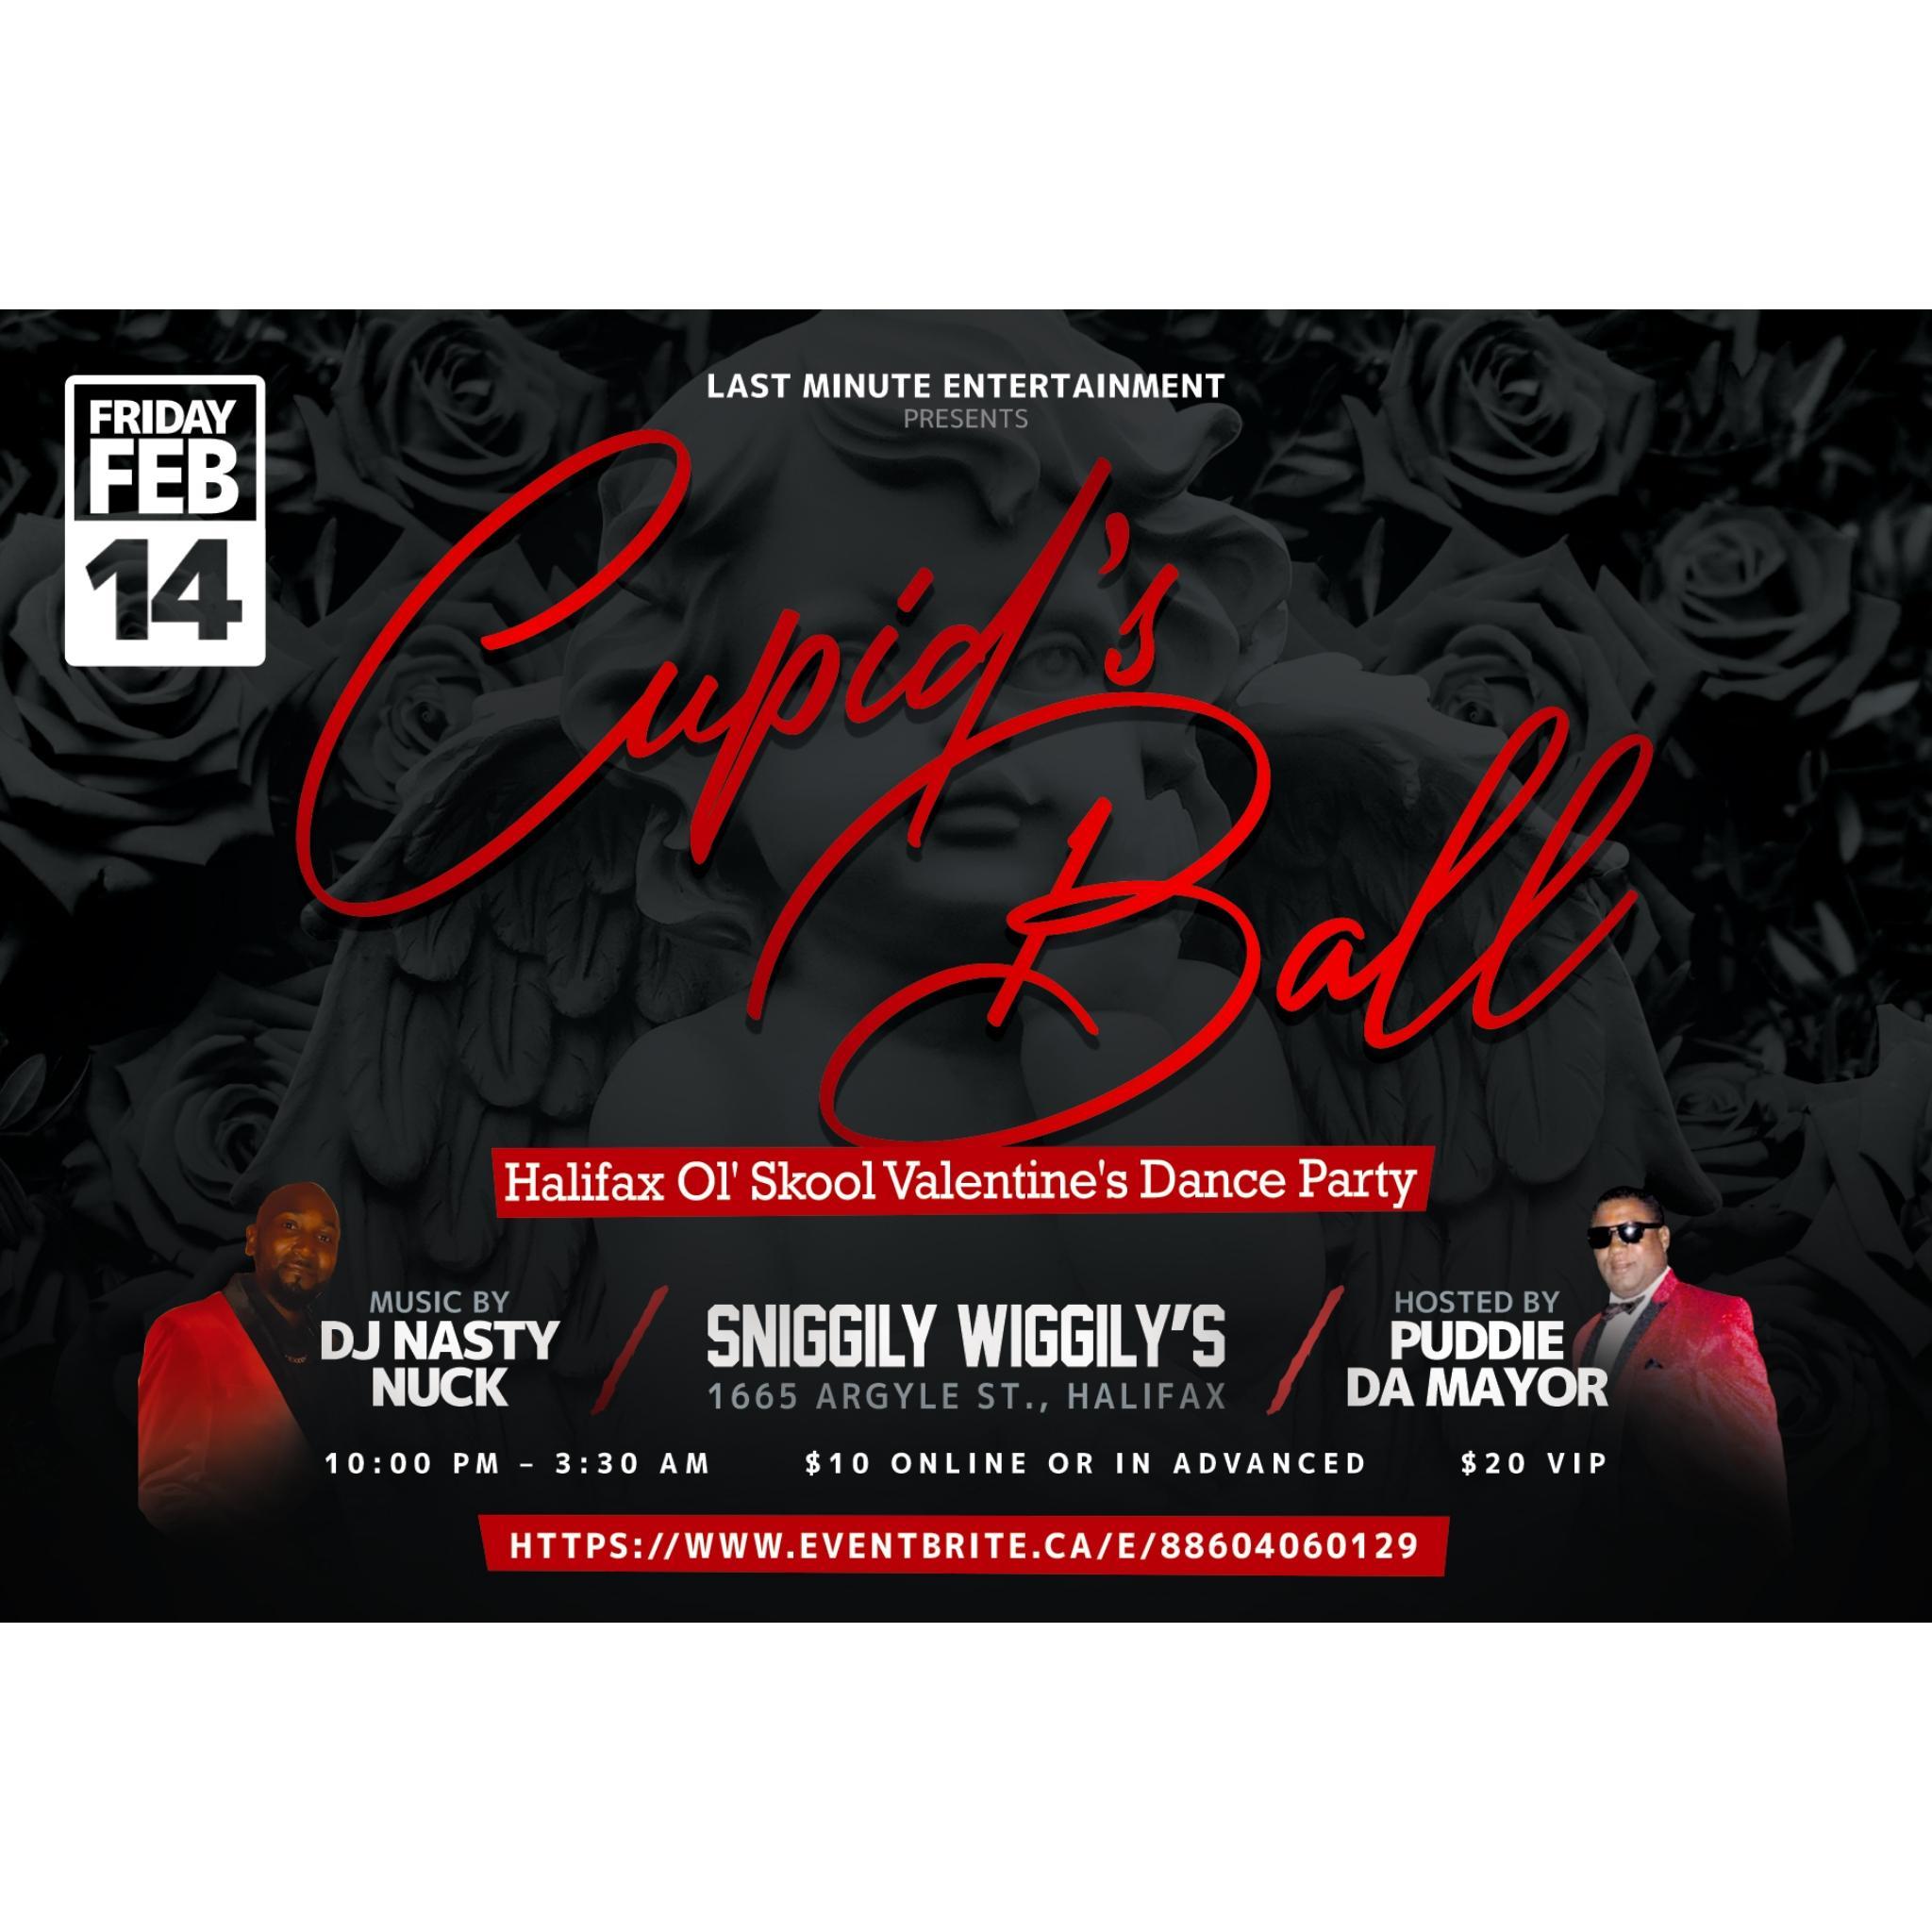 Halifax's Cupid's Ball - Valentine's Ol Skool Dance Party